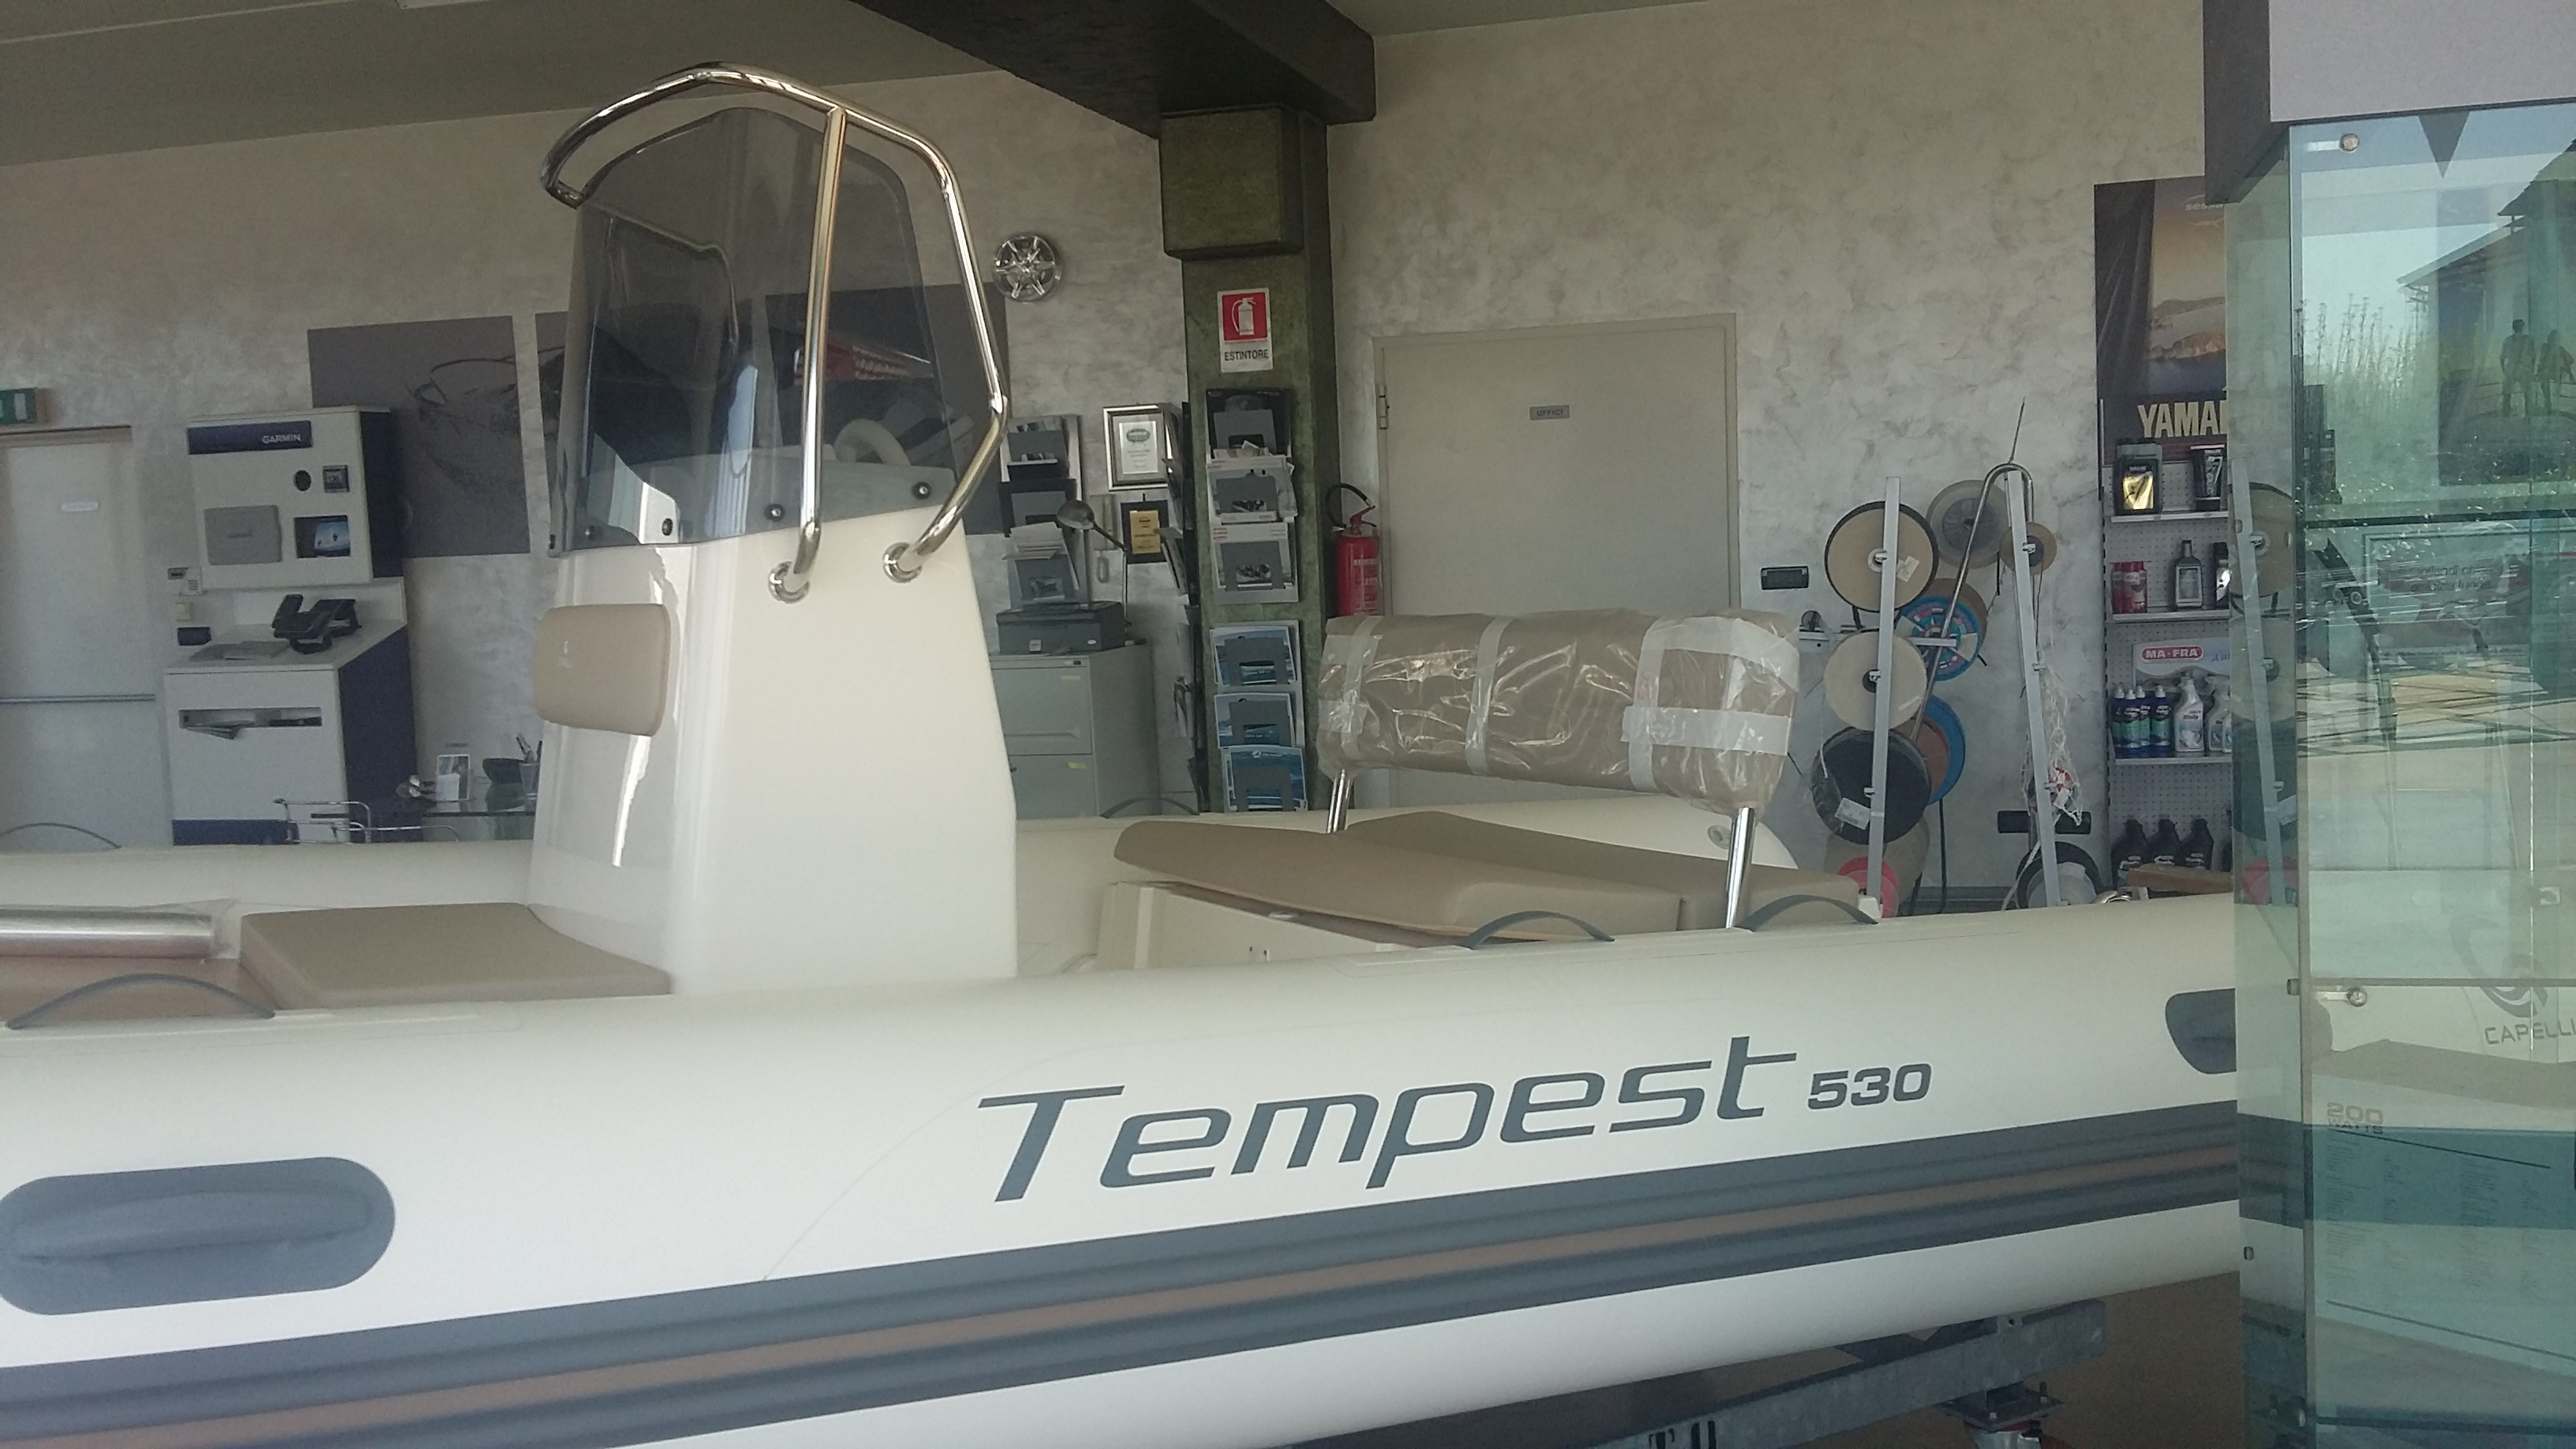 TEMPEST 530 + YAMAHA F40DETL